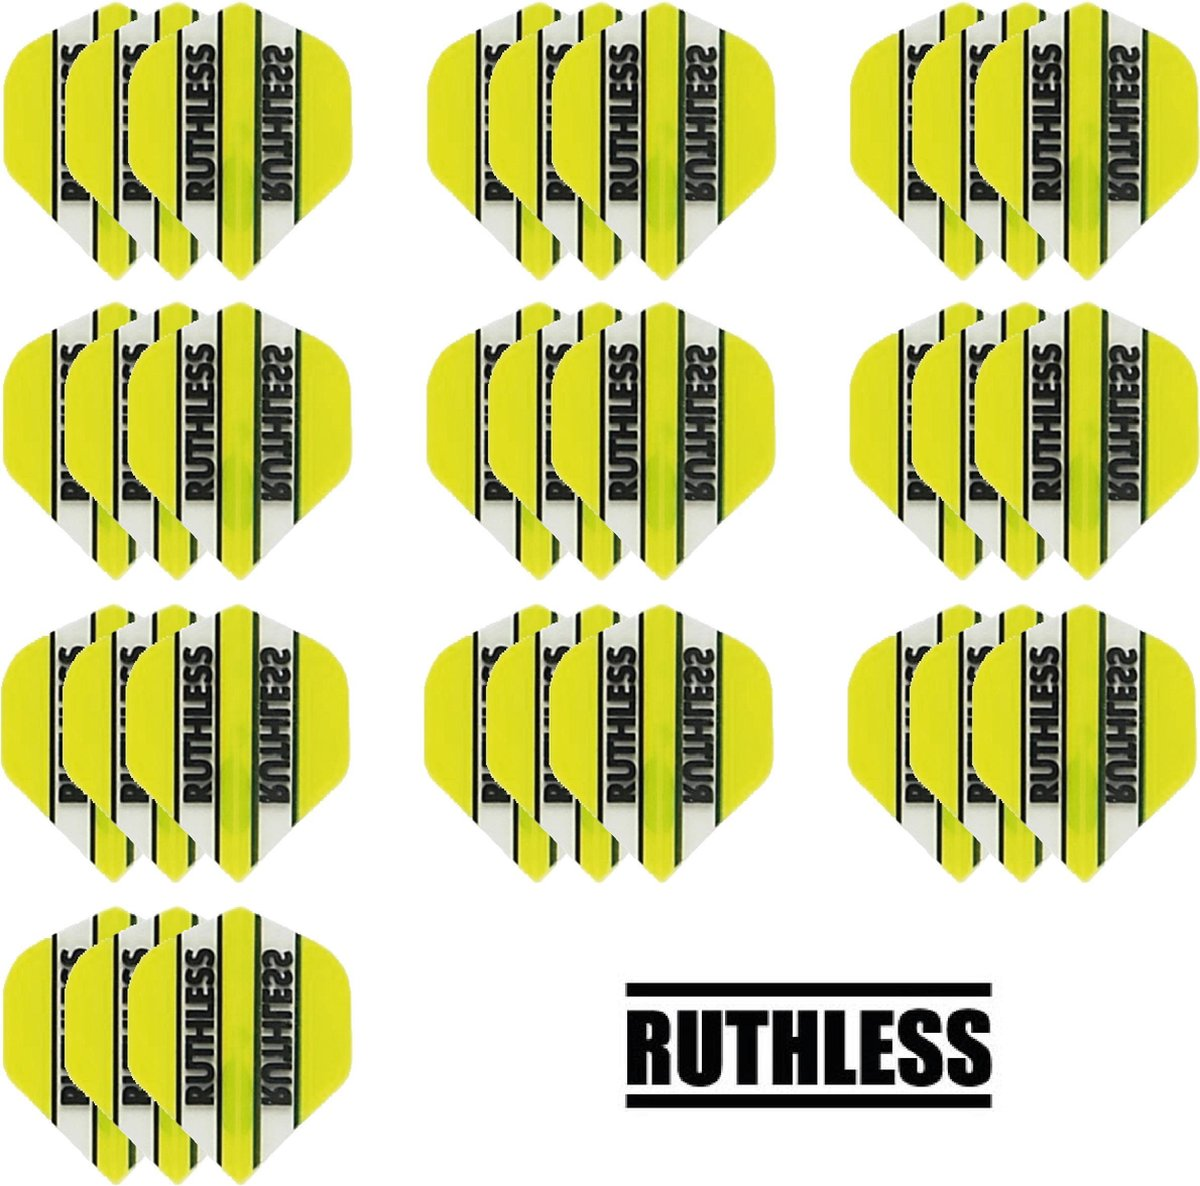 deDartshop 10 Sets (30 stuks) Ruthless flights Multipack - Geel - darts flights